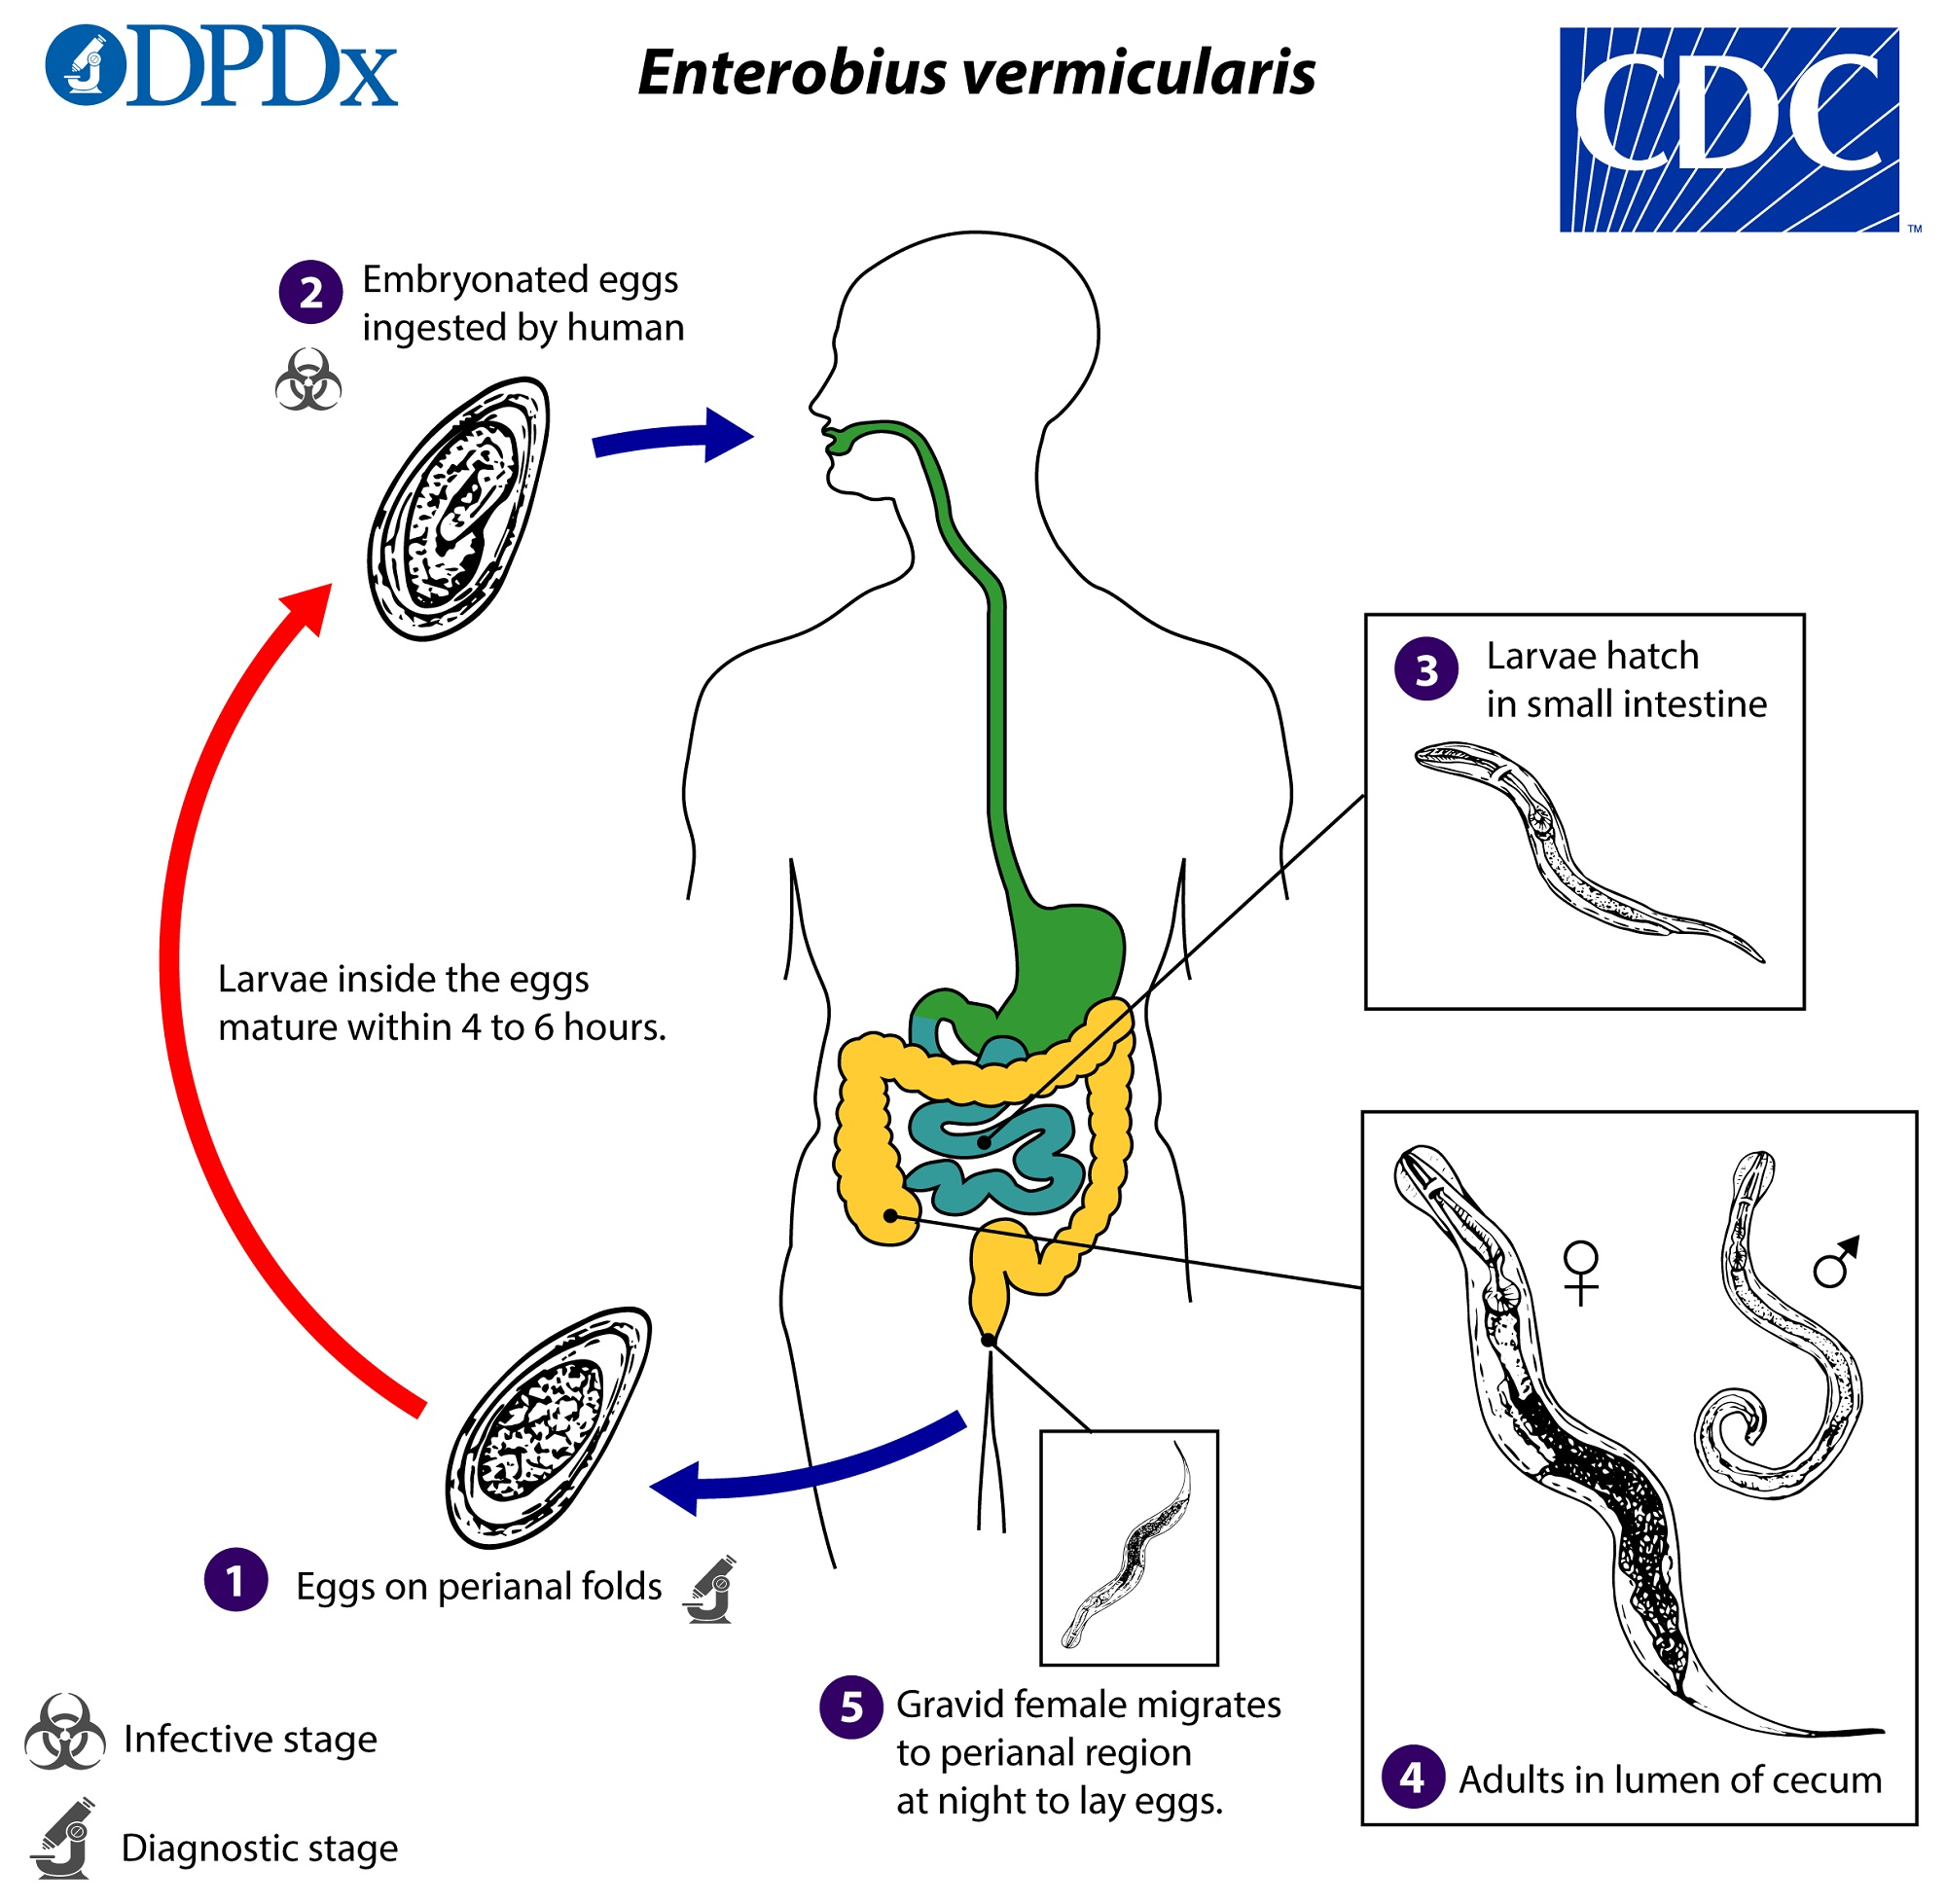 Enterobiasis hélix, Helix enterobiosis. Enterobiasis (pinworms) - Egészség